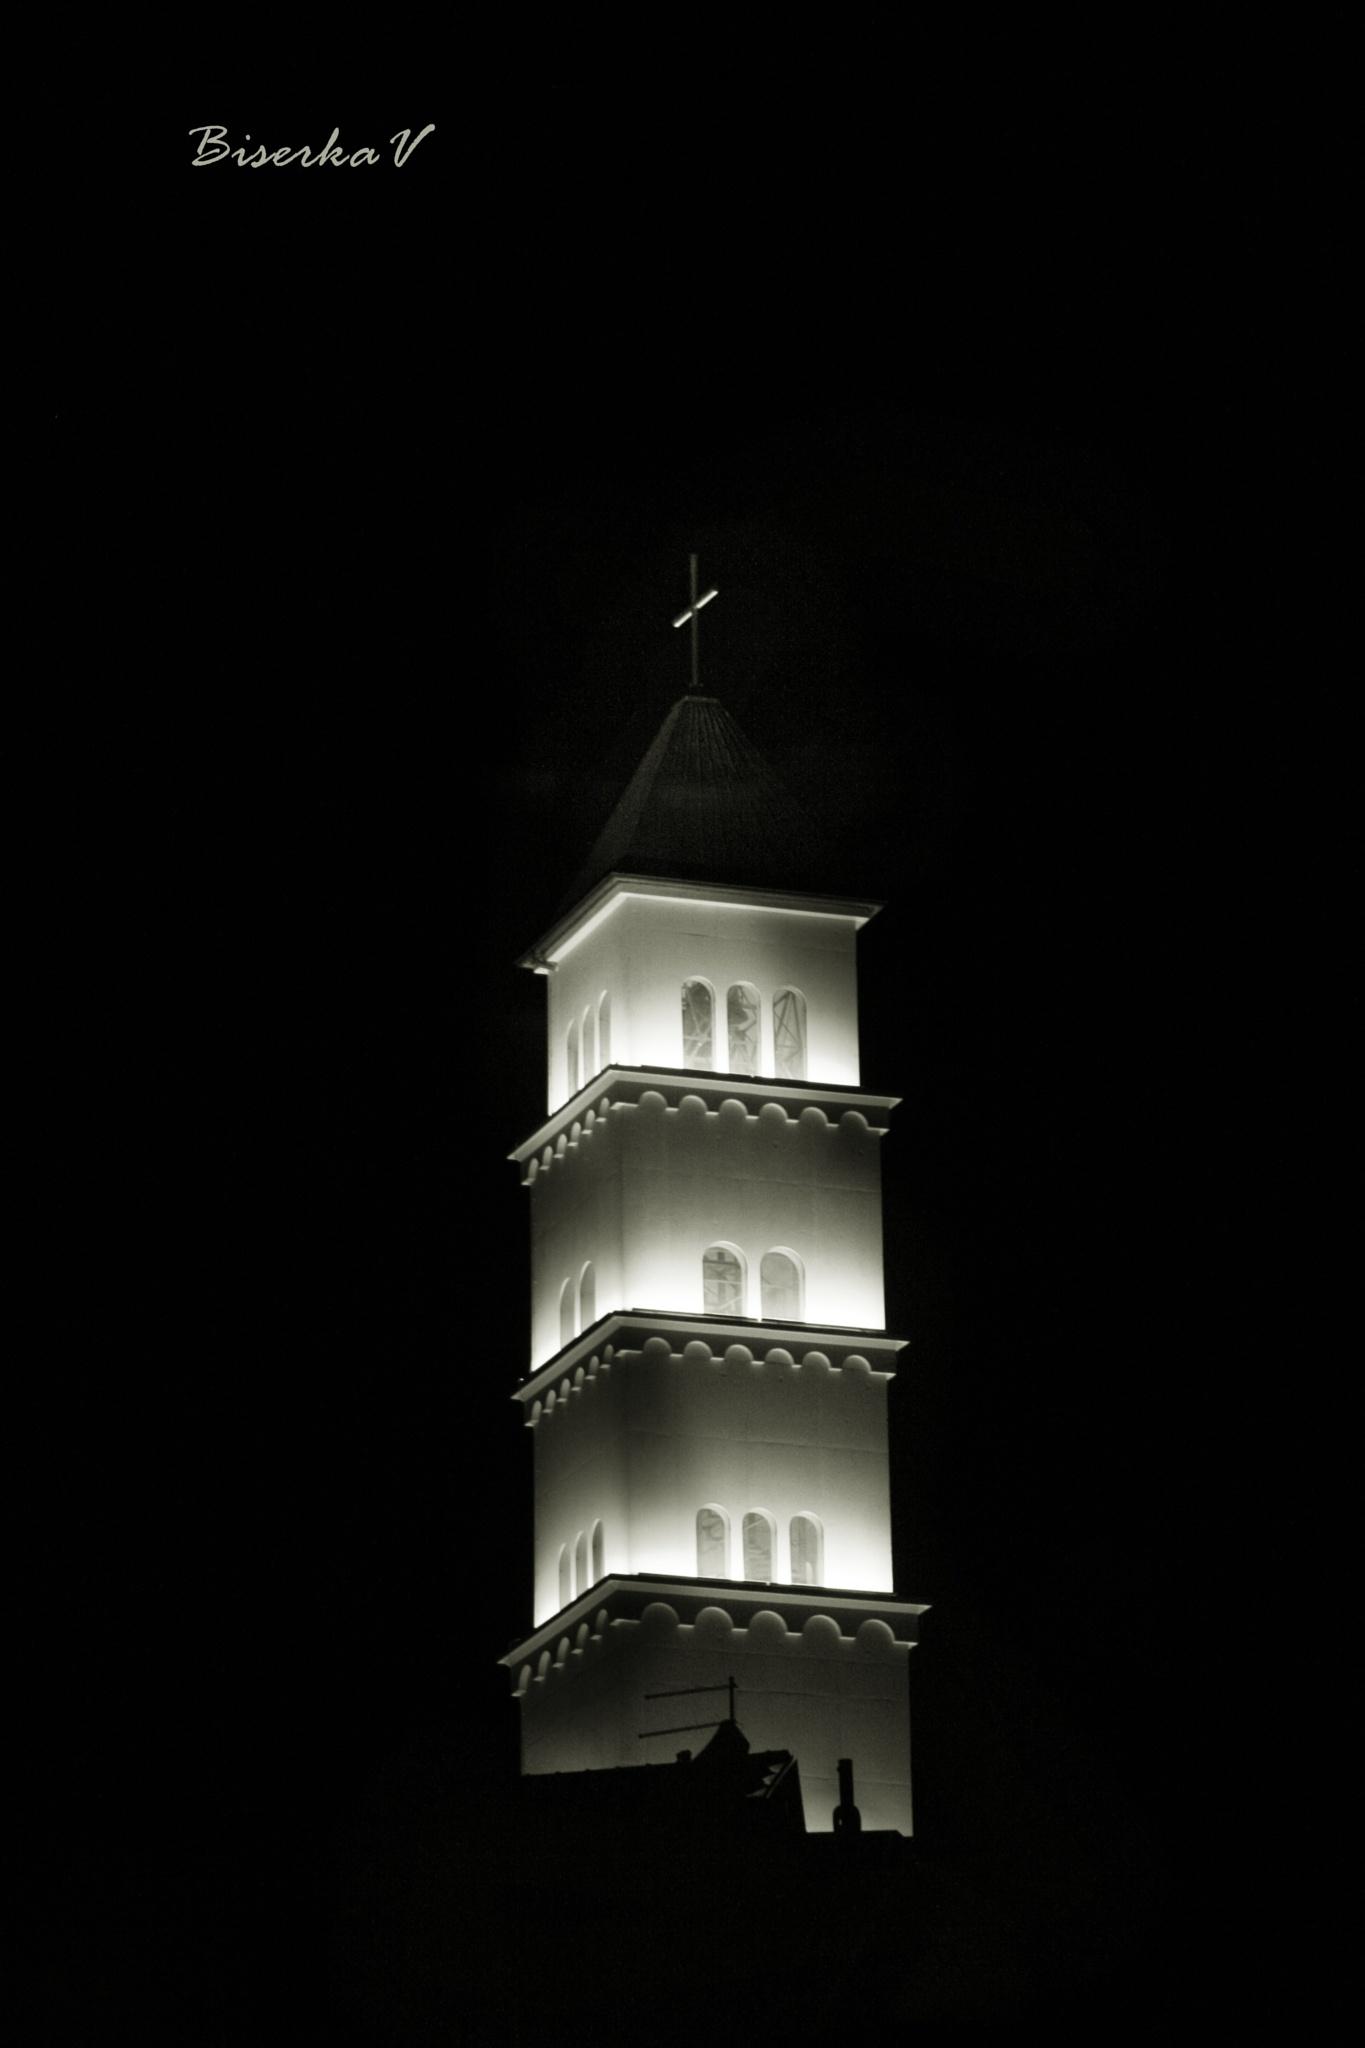 belfry by biserkavr